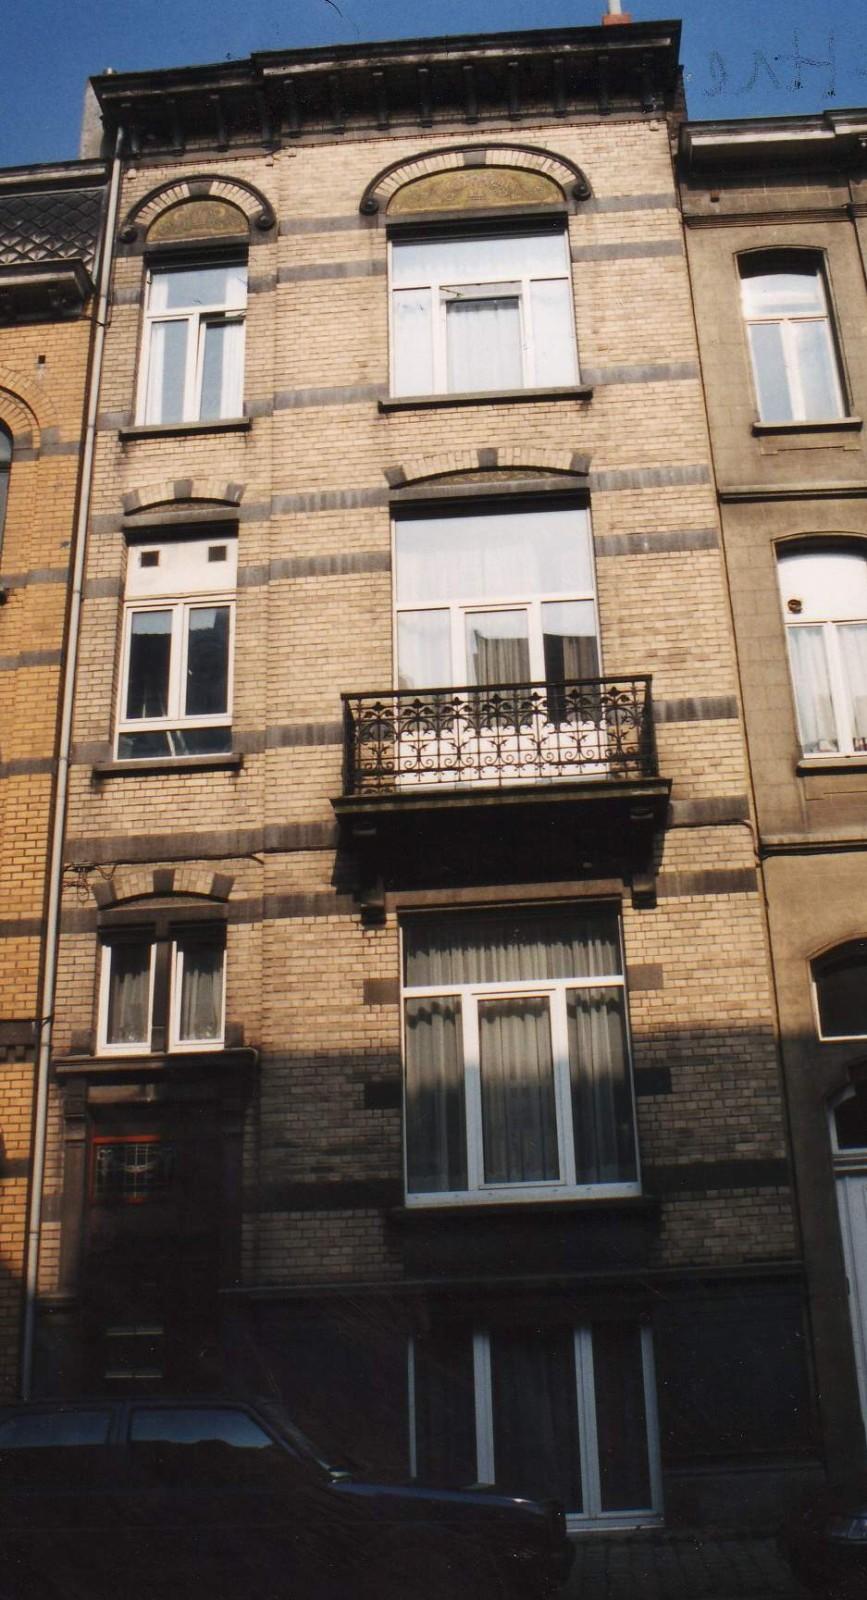 Atrebatenstraat 103., 1993